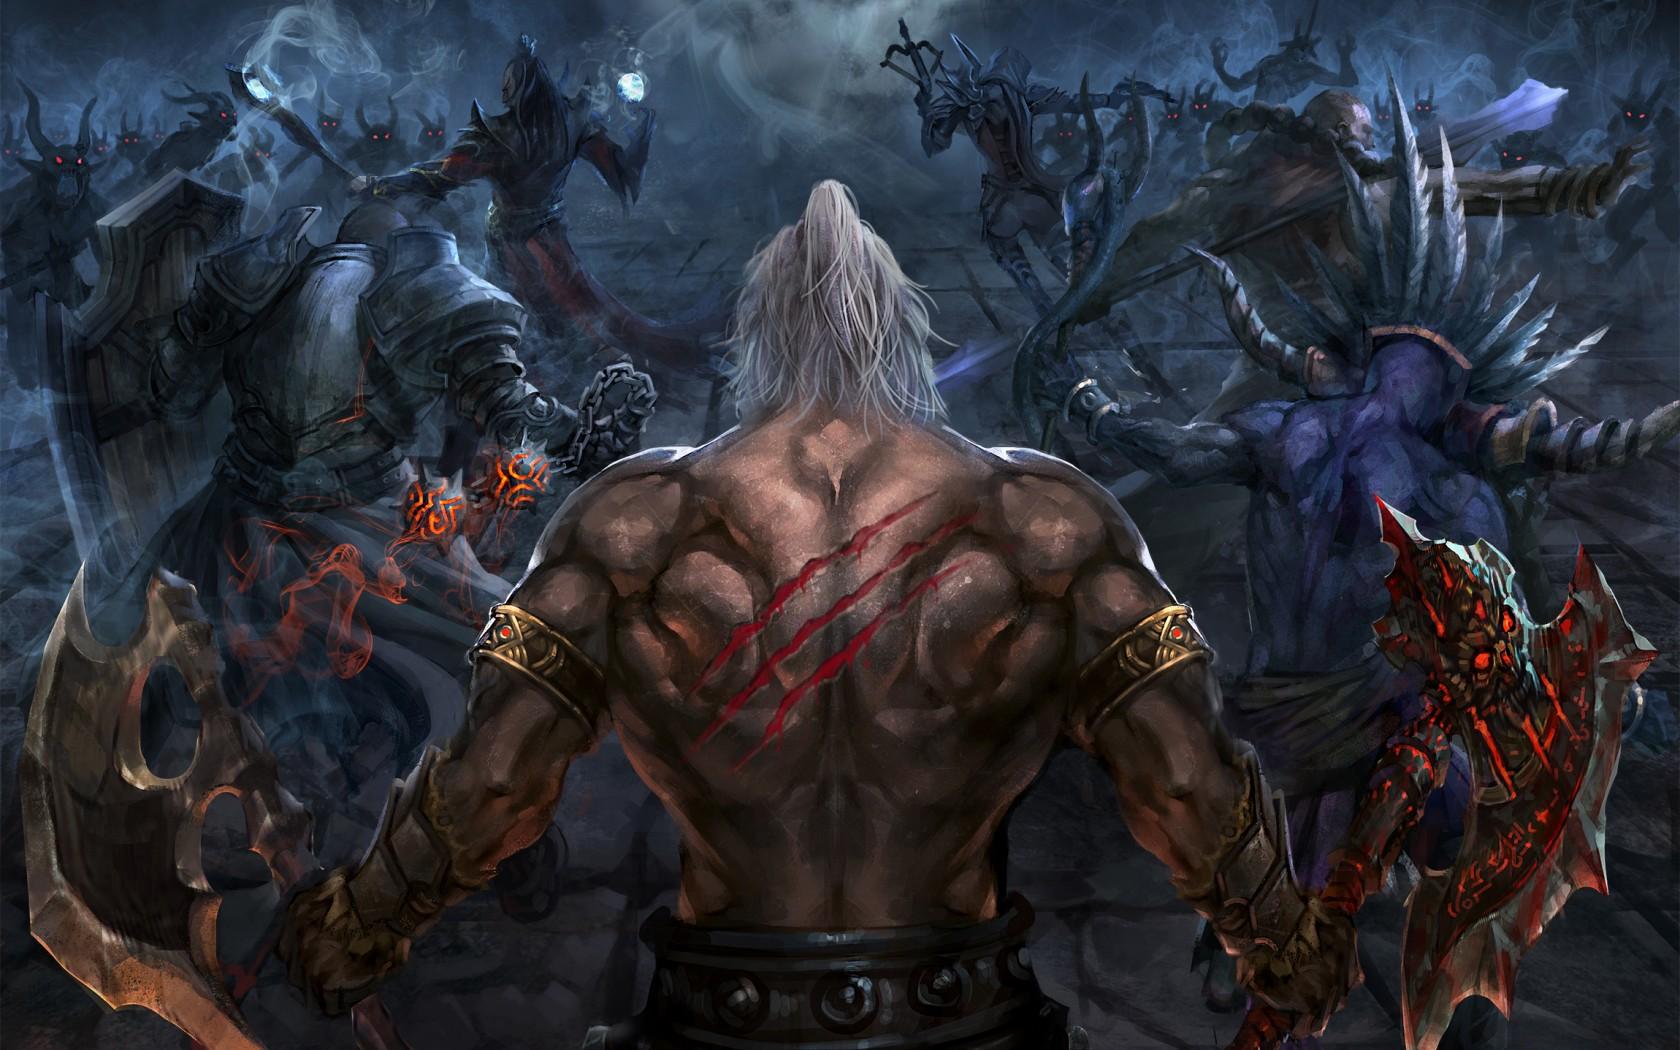 Diablo 3 Barbarian Wallpaper 1680x1050